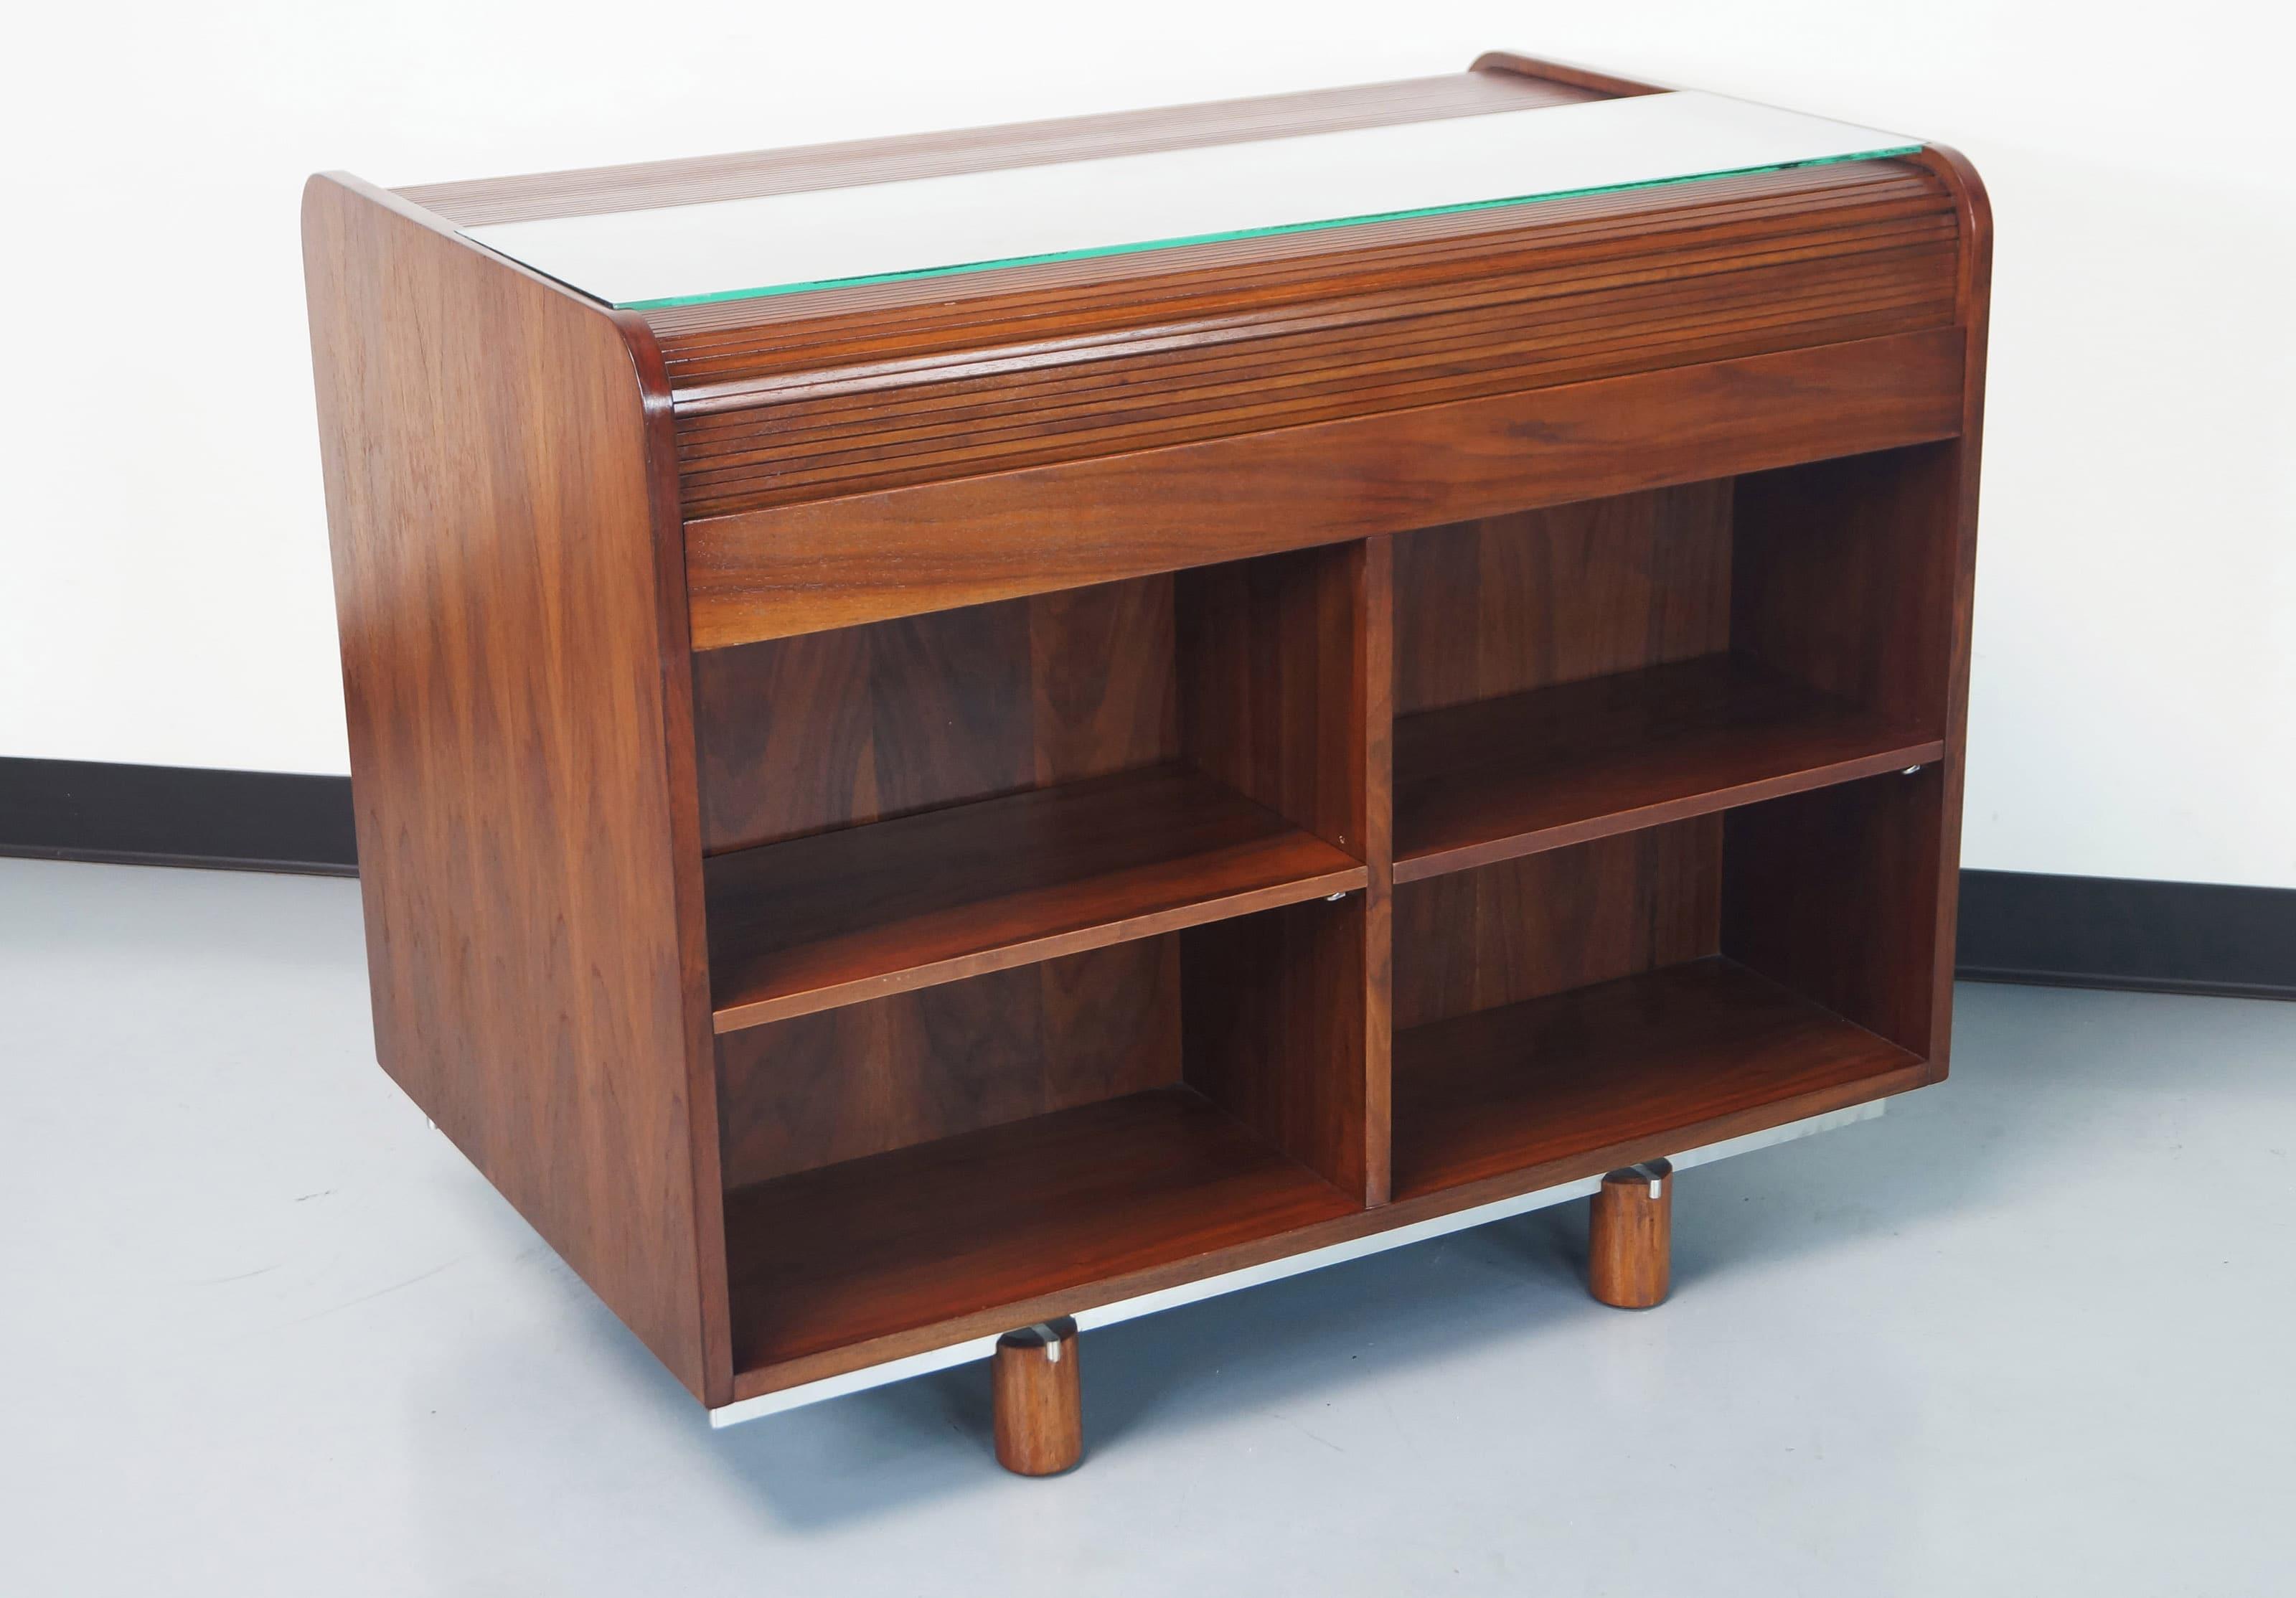 Writing Desk by Gianfranco Frattini for Bernini